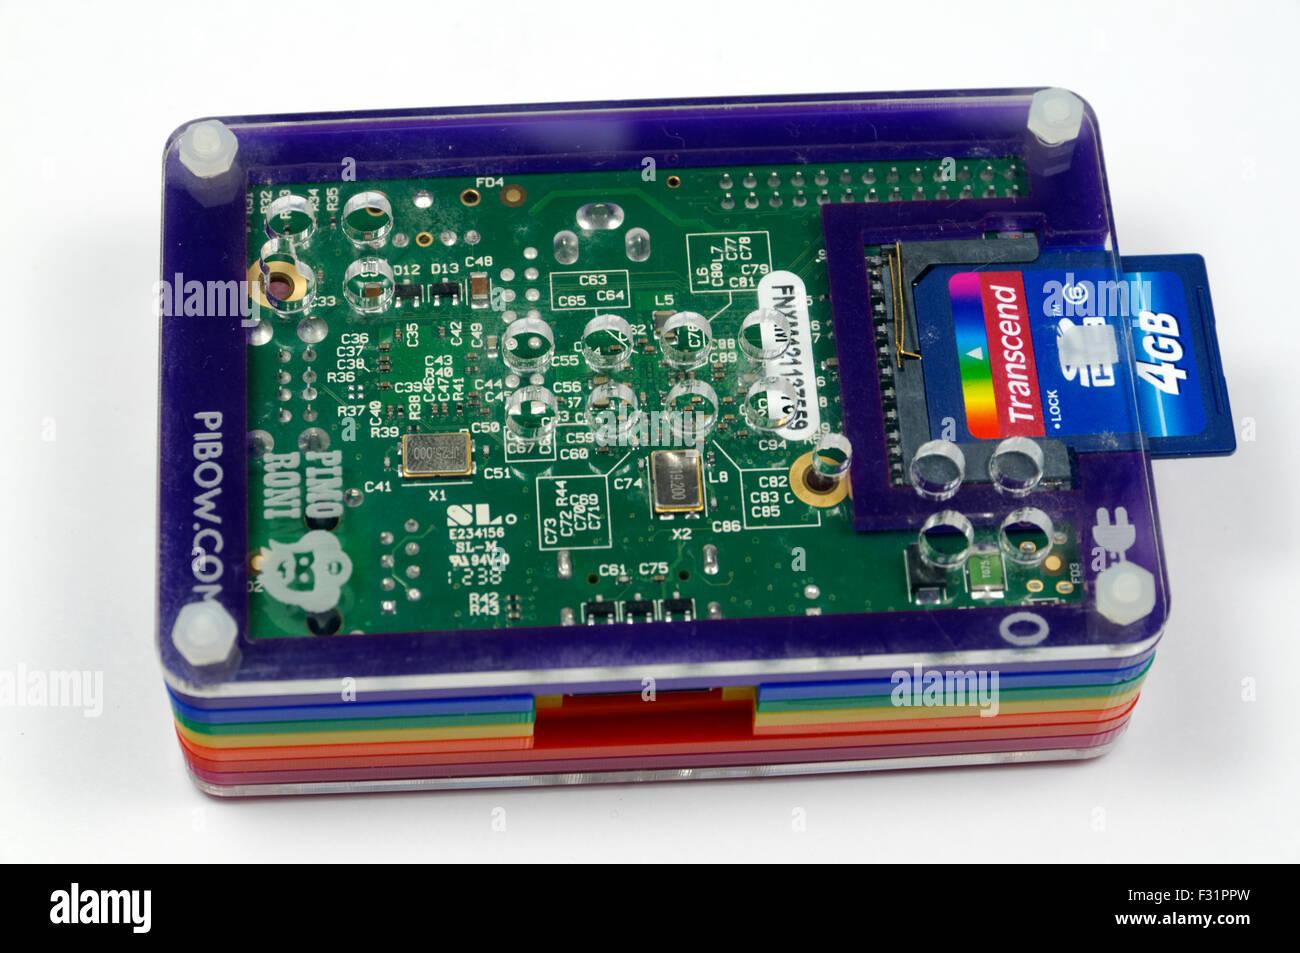 Raspberry Pi Computer. - Stock Image